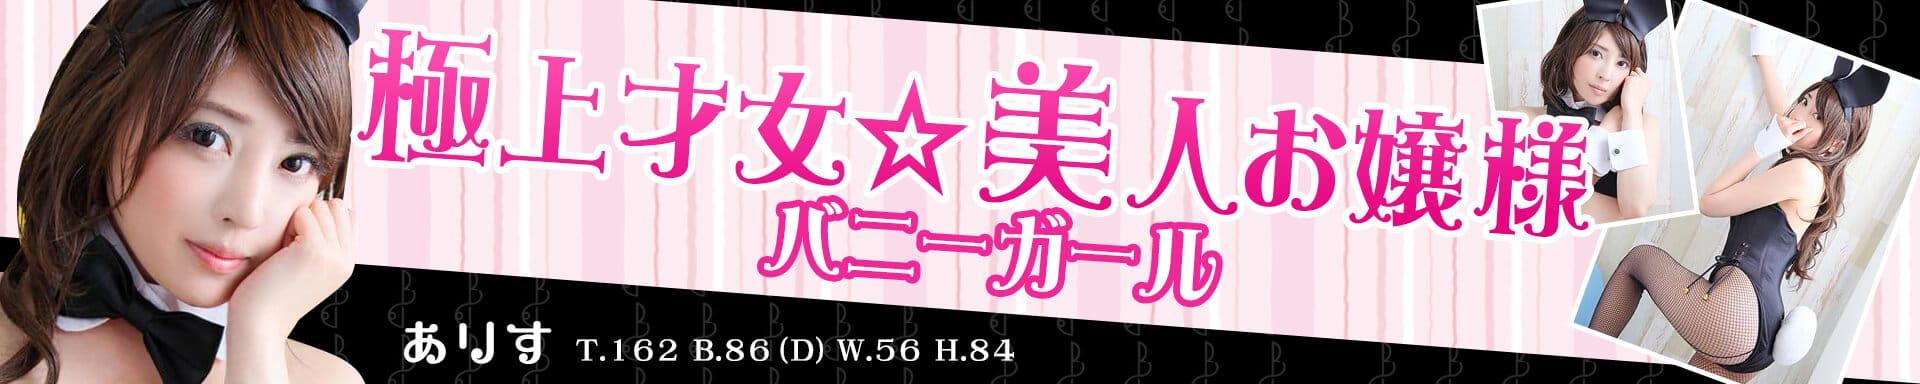 BUNNY GIRL~バニーガールと遊べる~渋谷本店 その2